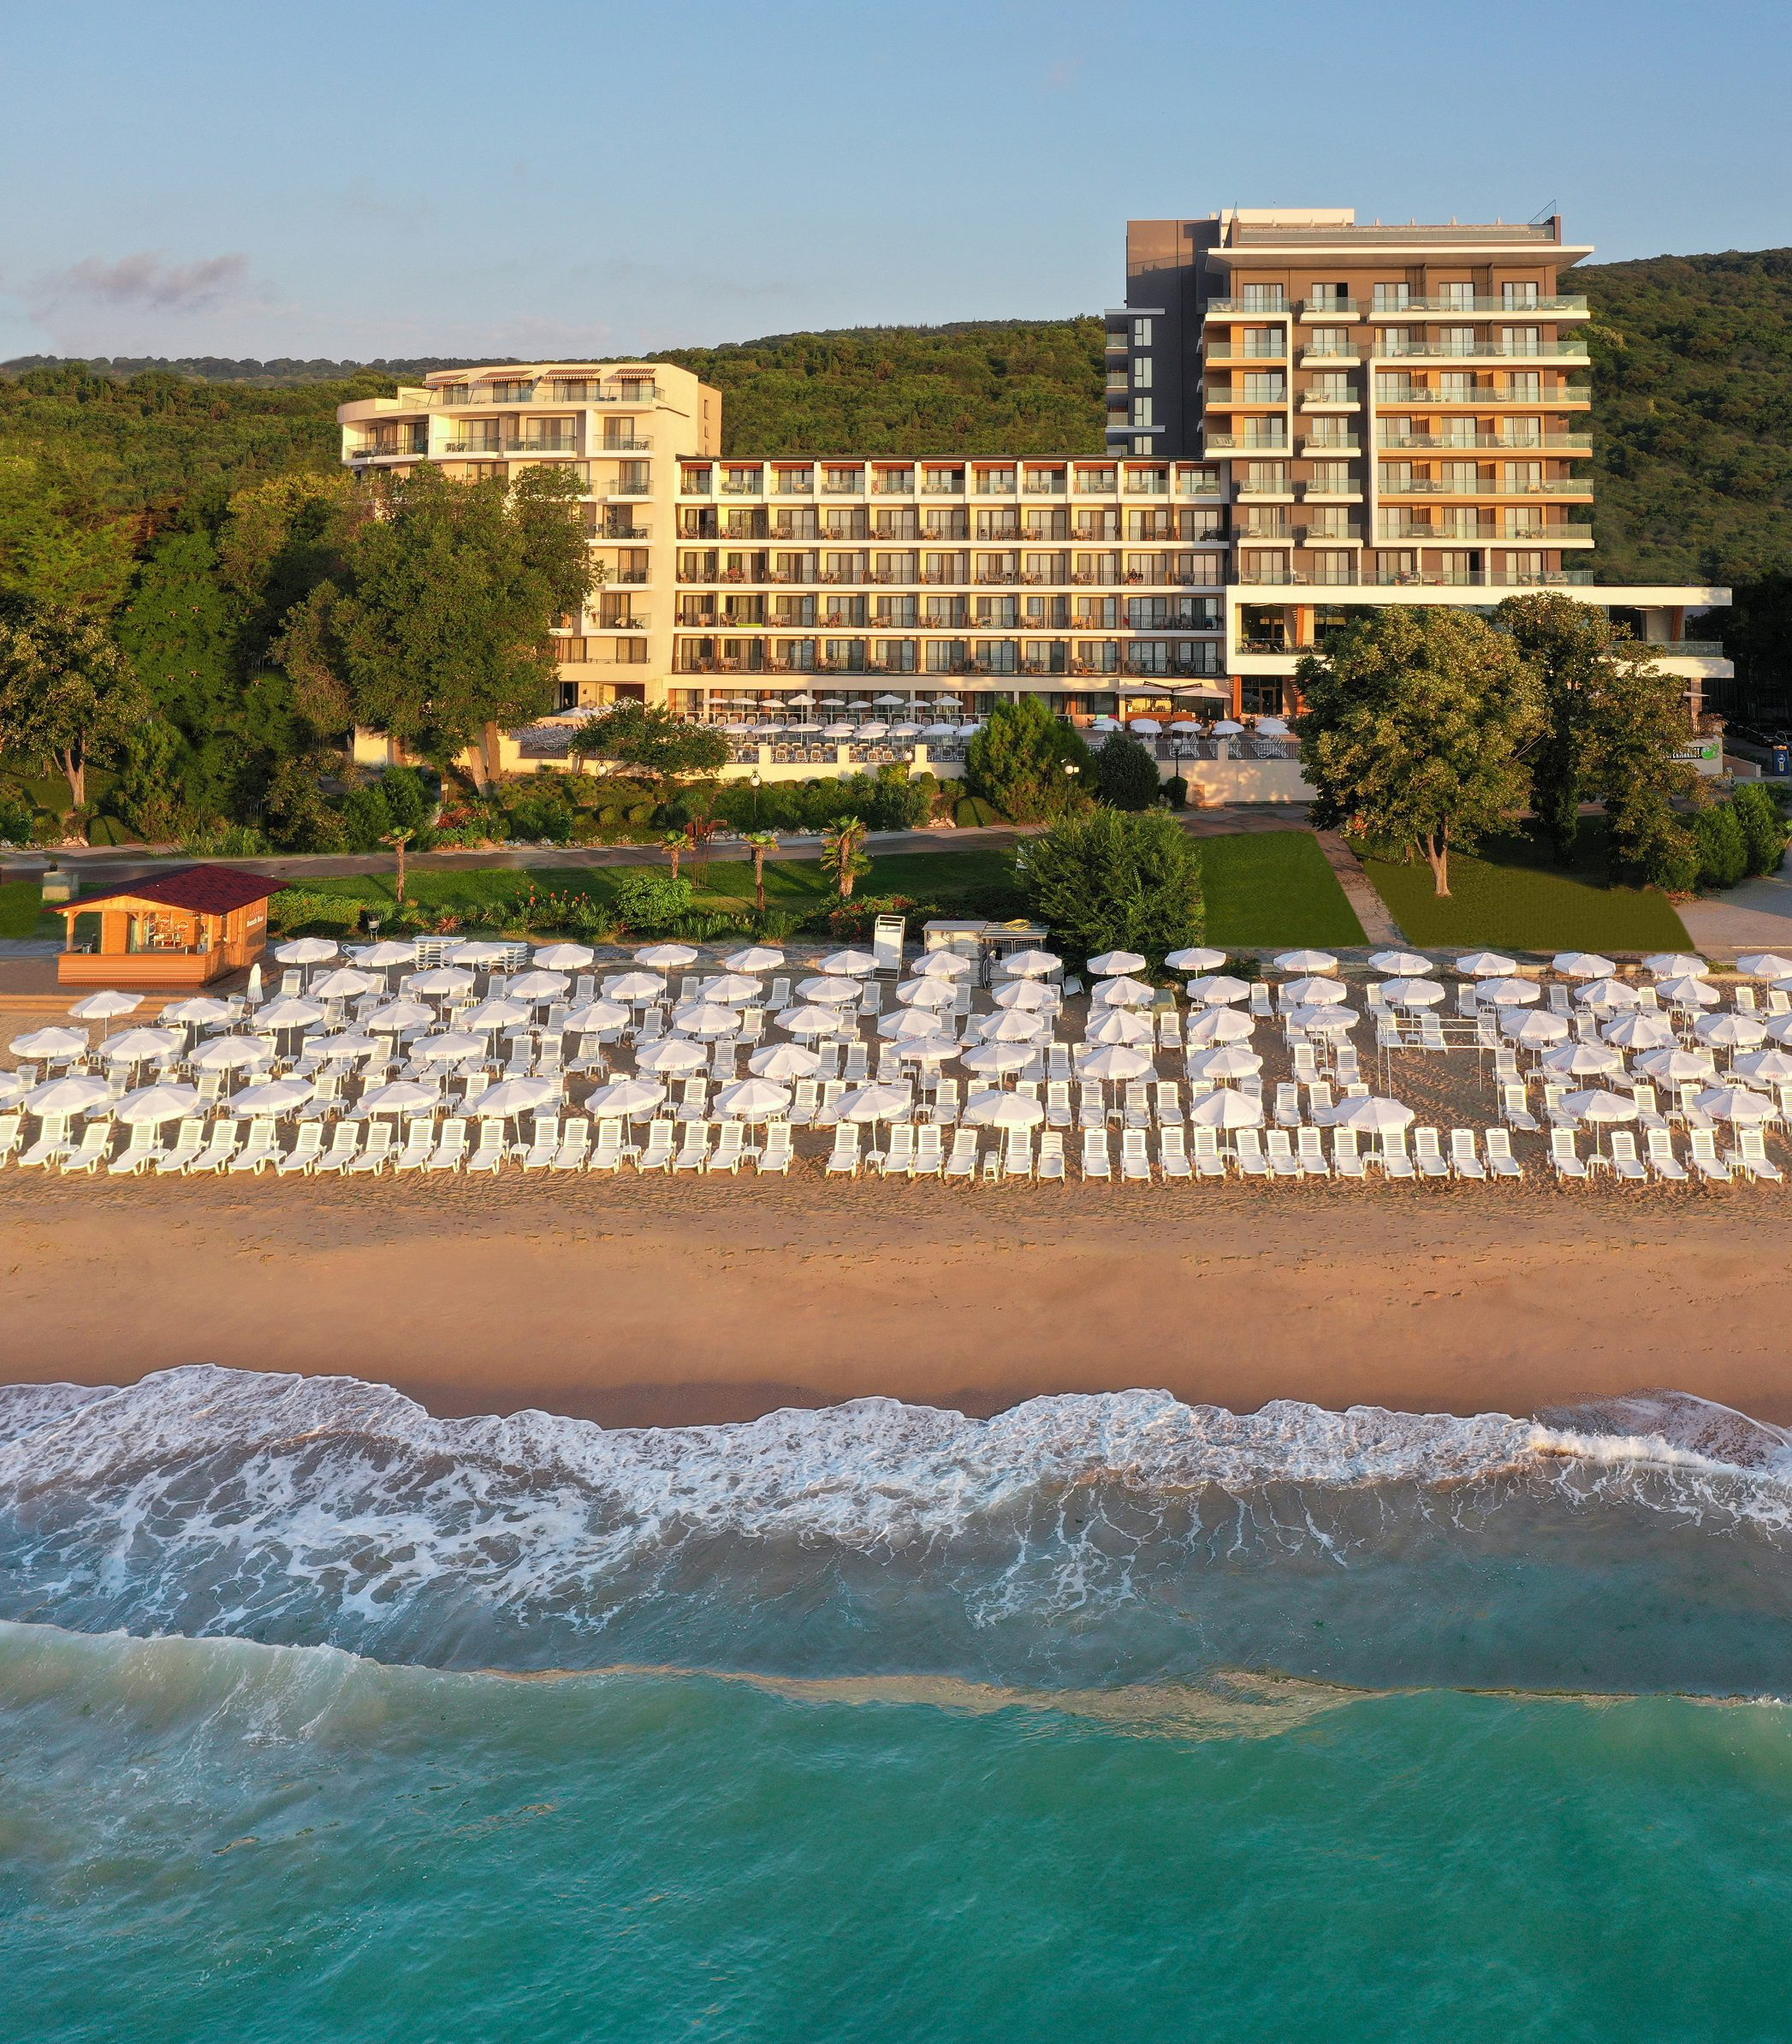 Грифид хотел Вистамар, Златни пясъци